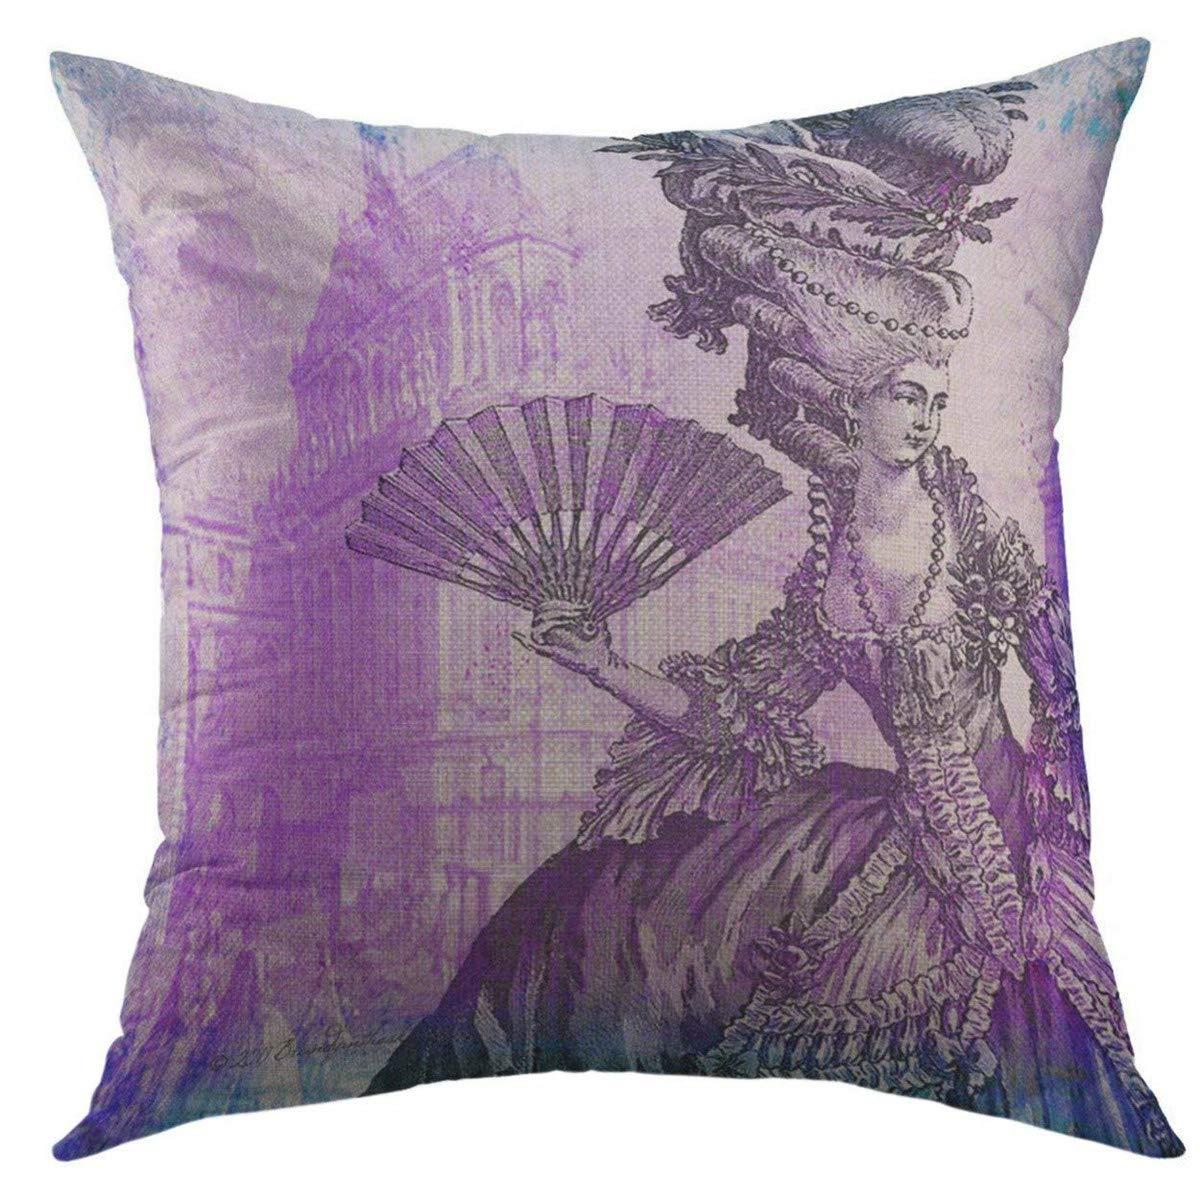 Mugod Decorative Throw Pillow Cover for Couch Sofa,Blue Antique Marie Antoinette Versailles Purple Vintage Home Decor Pillow case 18x18 Inch